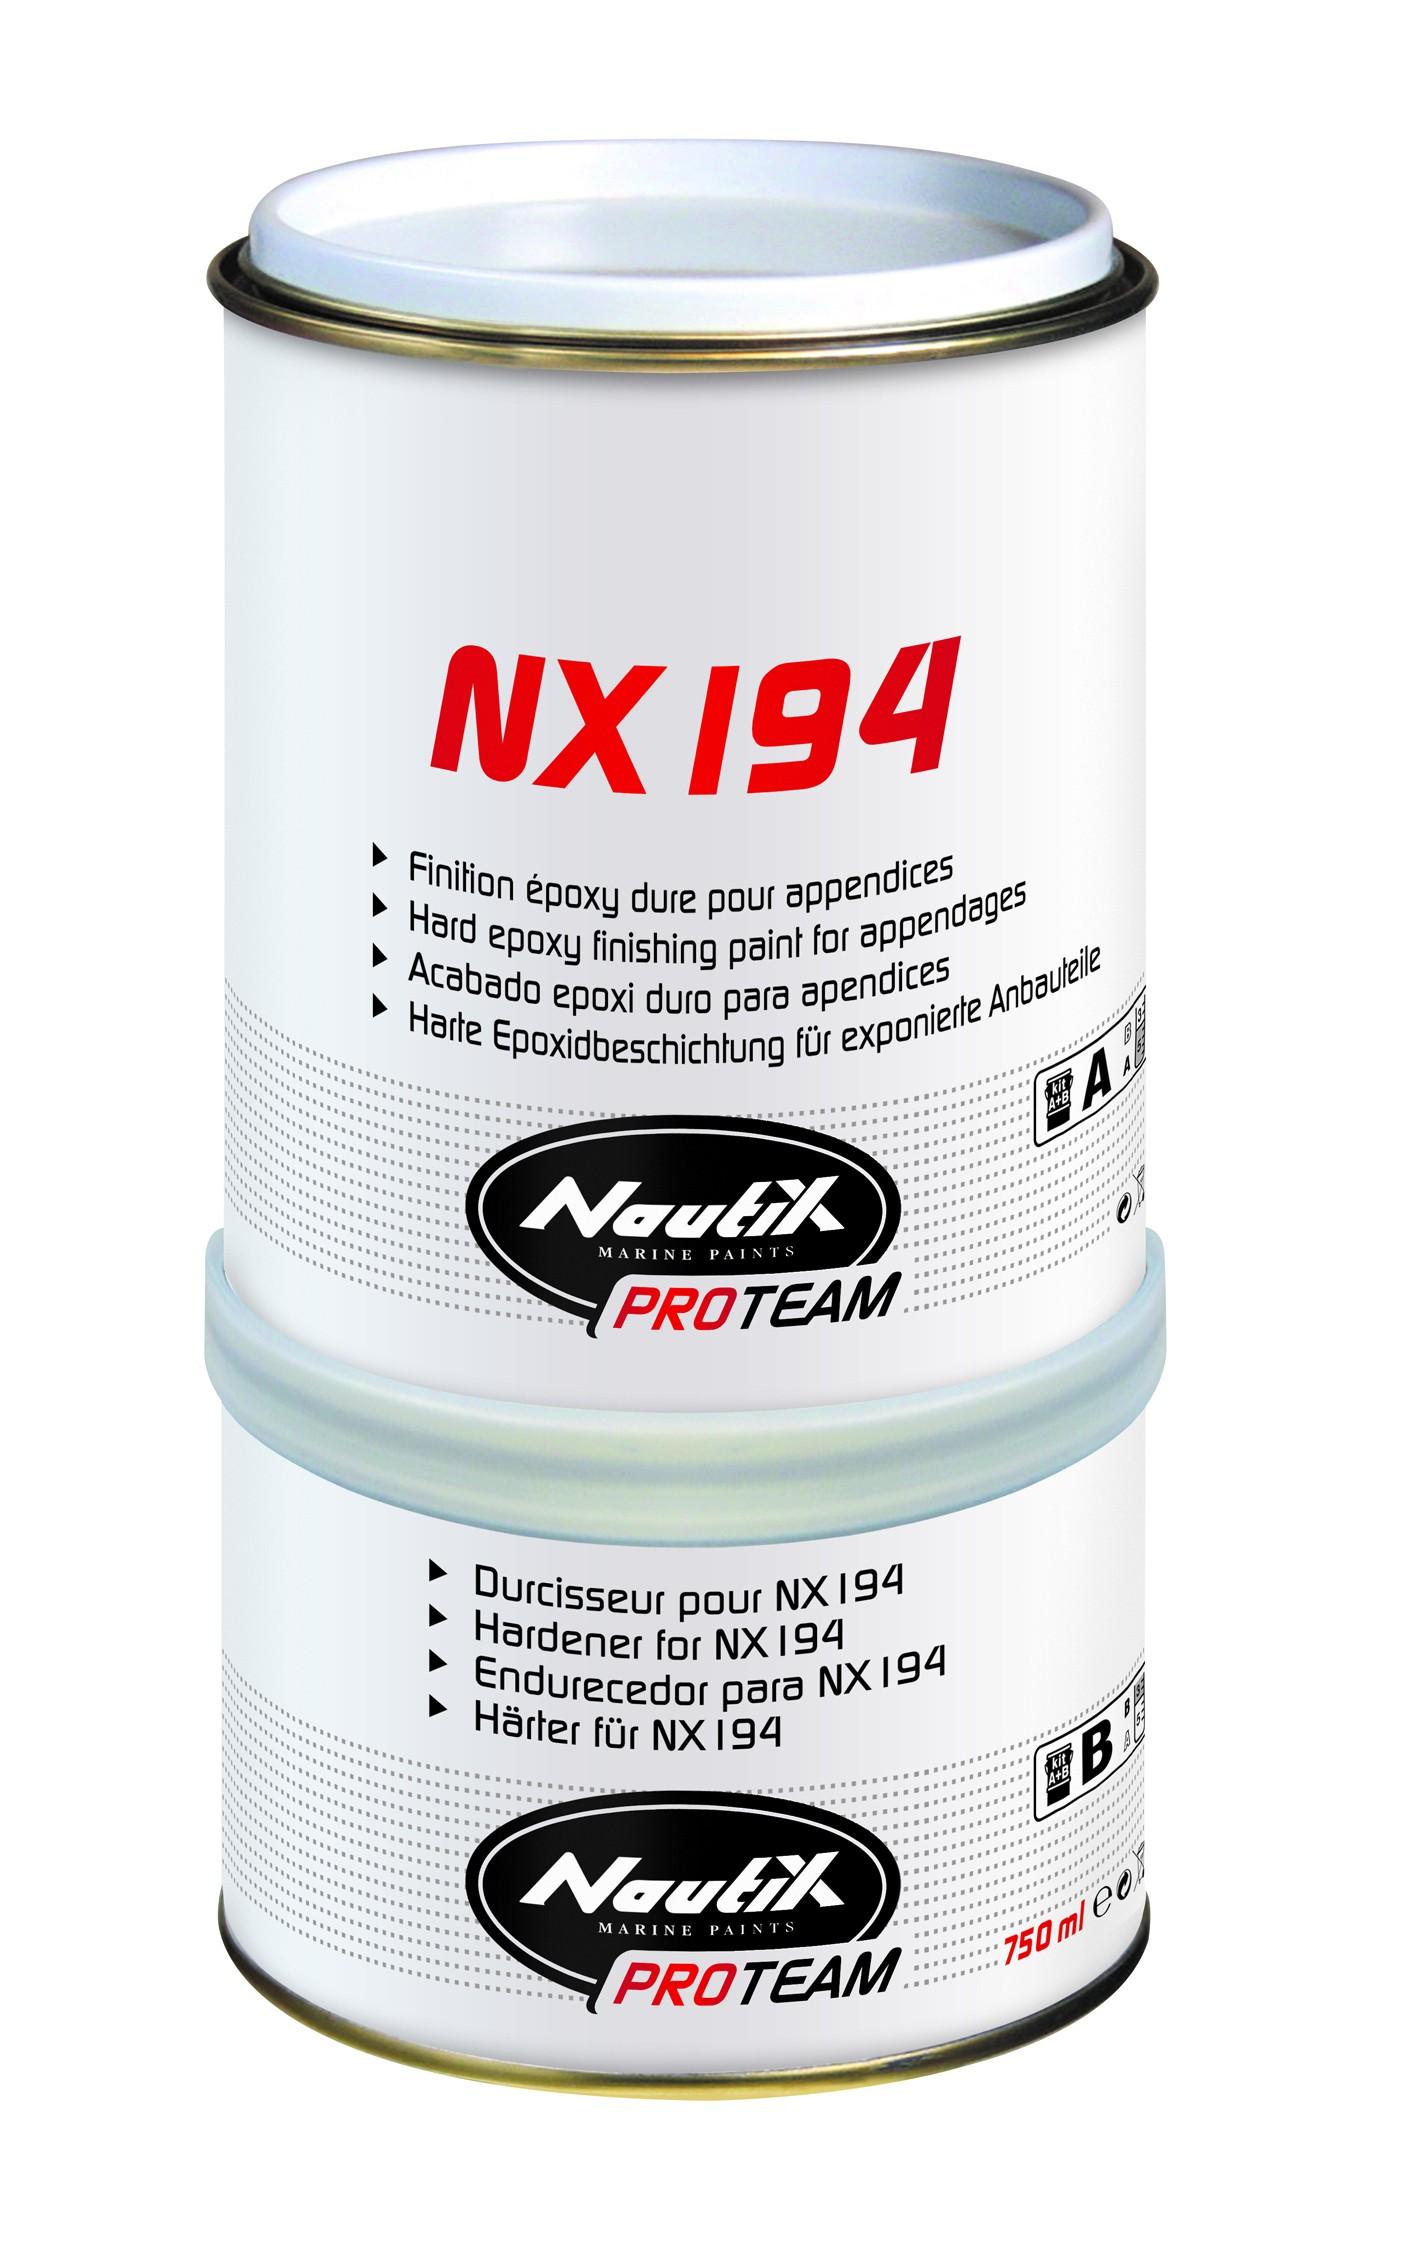 NX194